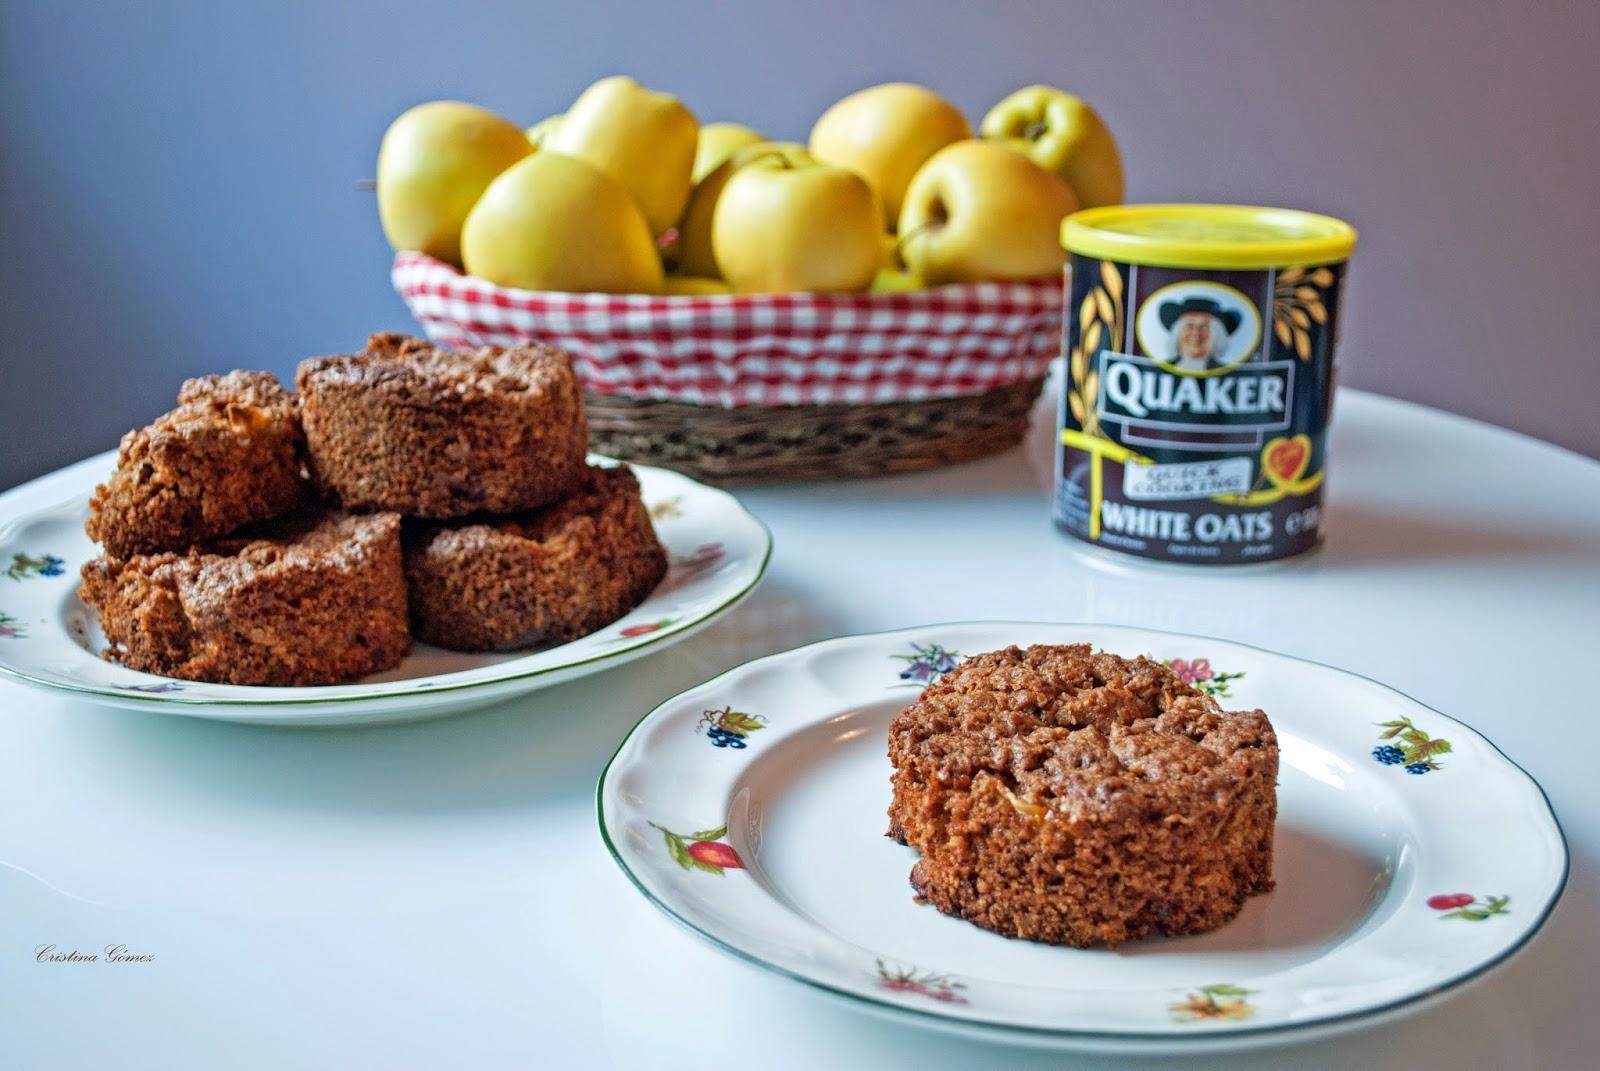 Mondays We Cook: Oatmeal, Apple & Cinnamon Cookies